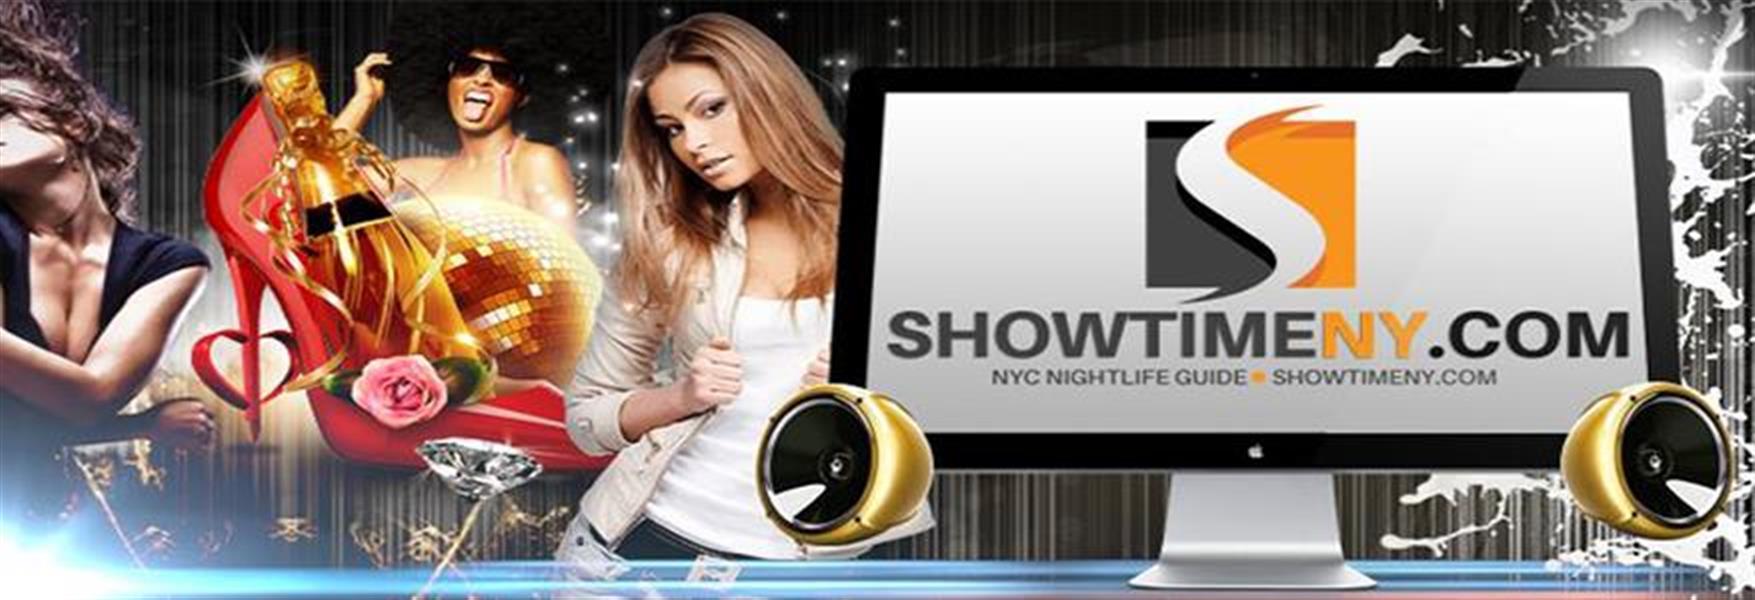 5943b469-0905-4c5c-9d23-79017b9b44e4_showtime banner long.jpg